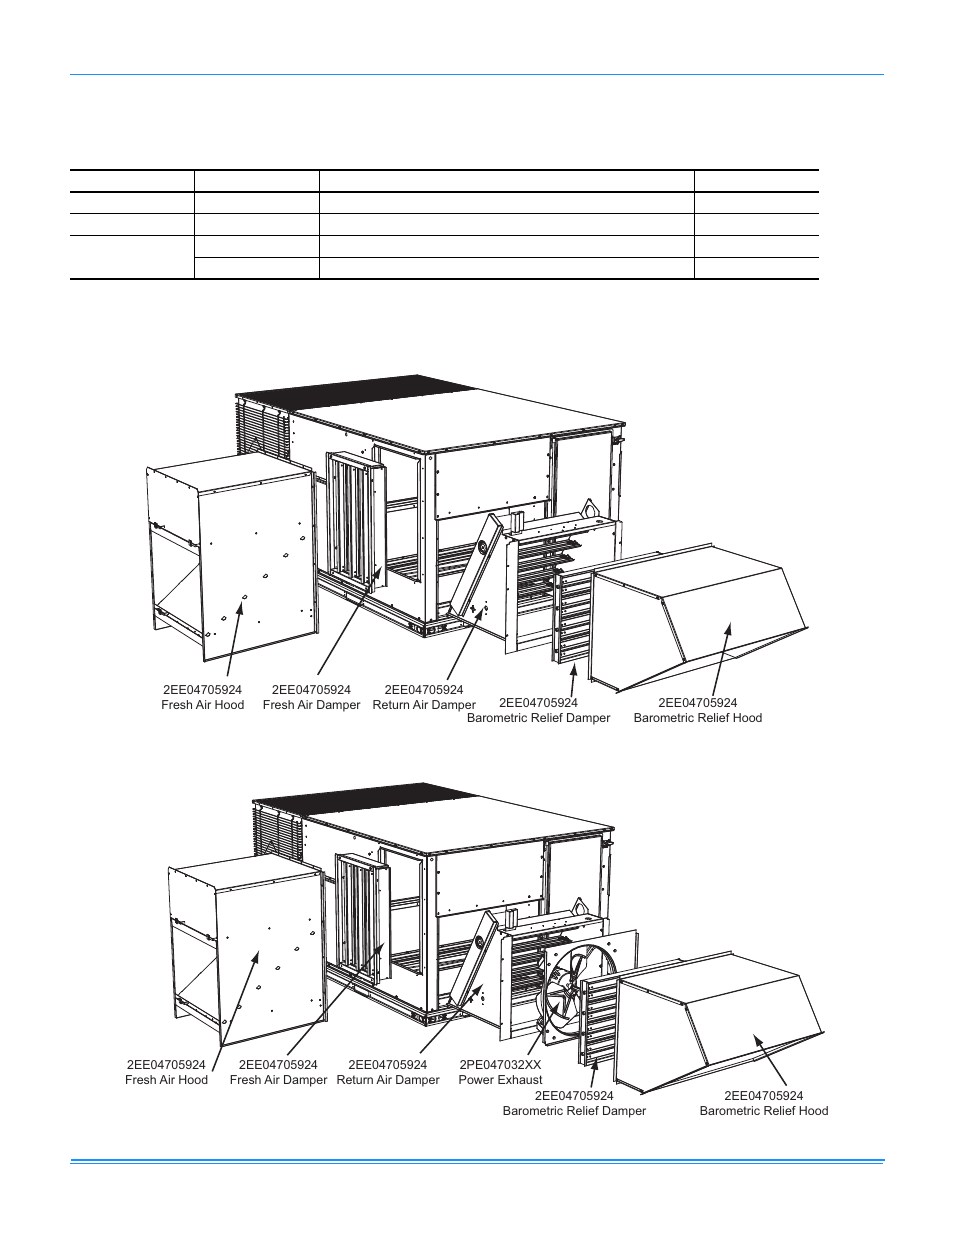 Economizer options, Factory installed downflow economizer | York